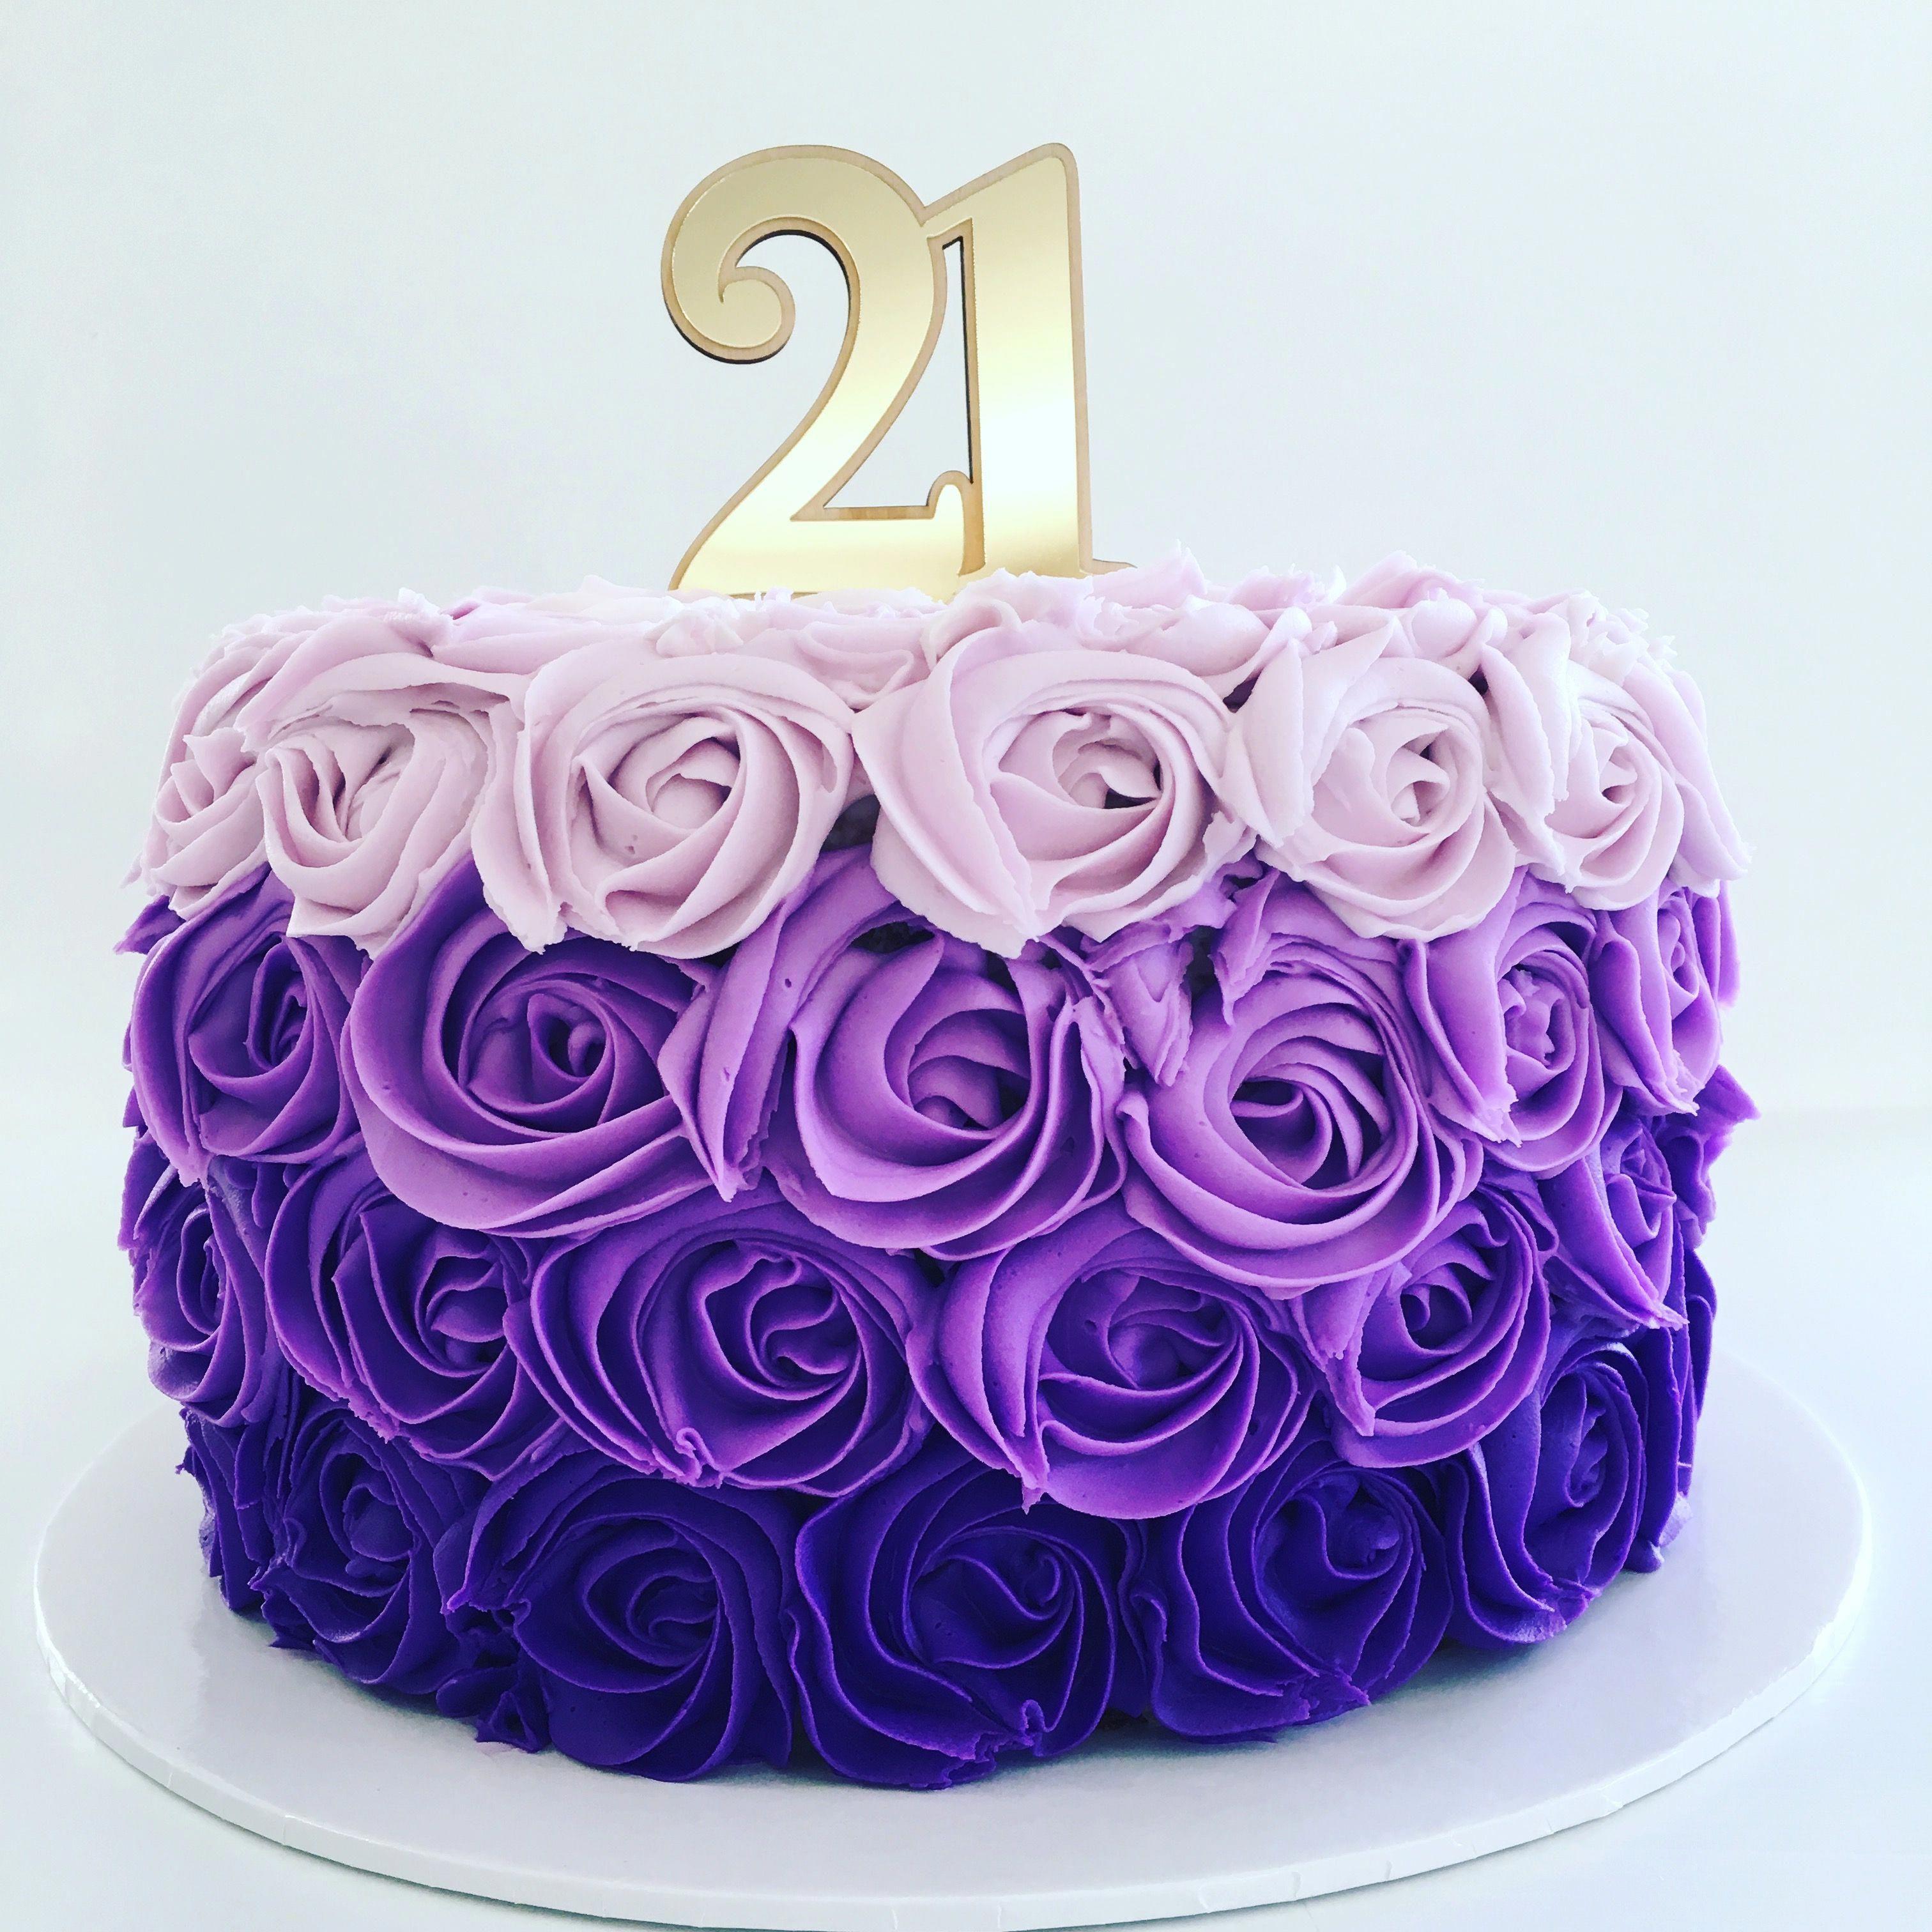 Cookeo Yogurt Cake Hq Recipes Recipe In 2020 Purple Cakes Birthday Birthday Cake Shots Butterfly Birthday Cakes